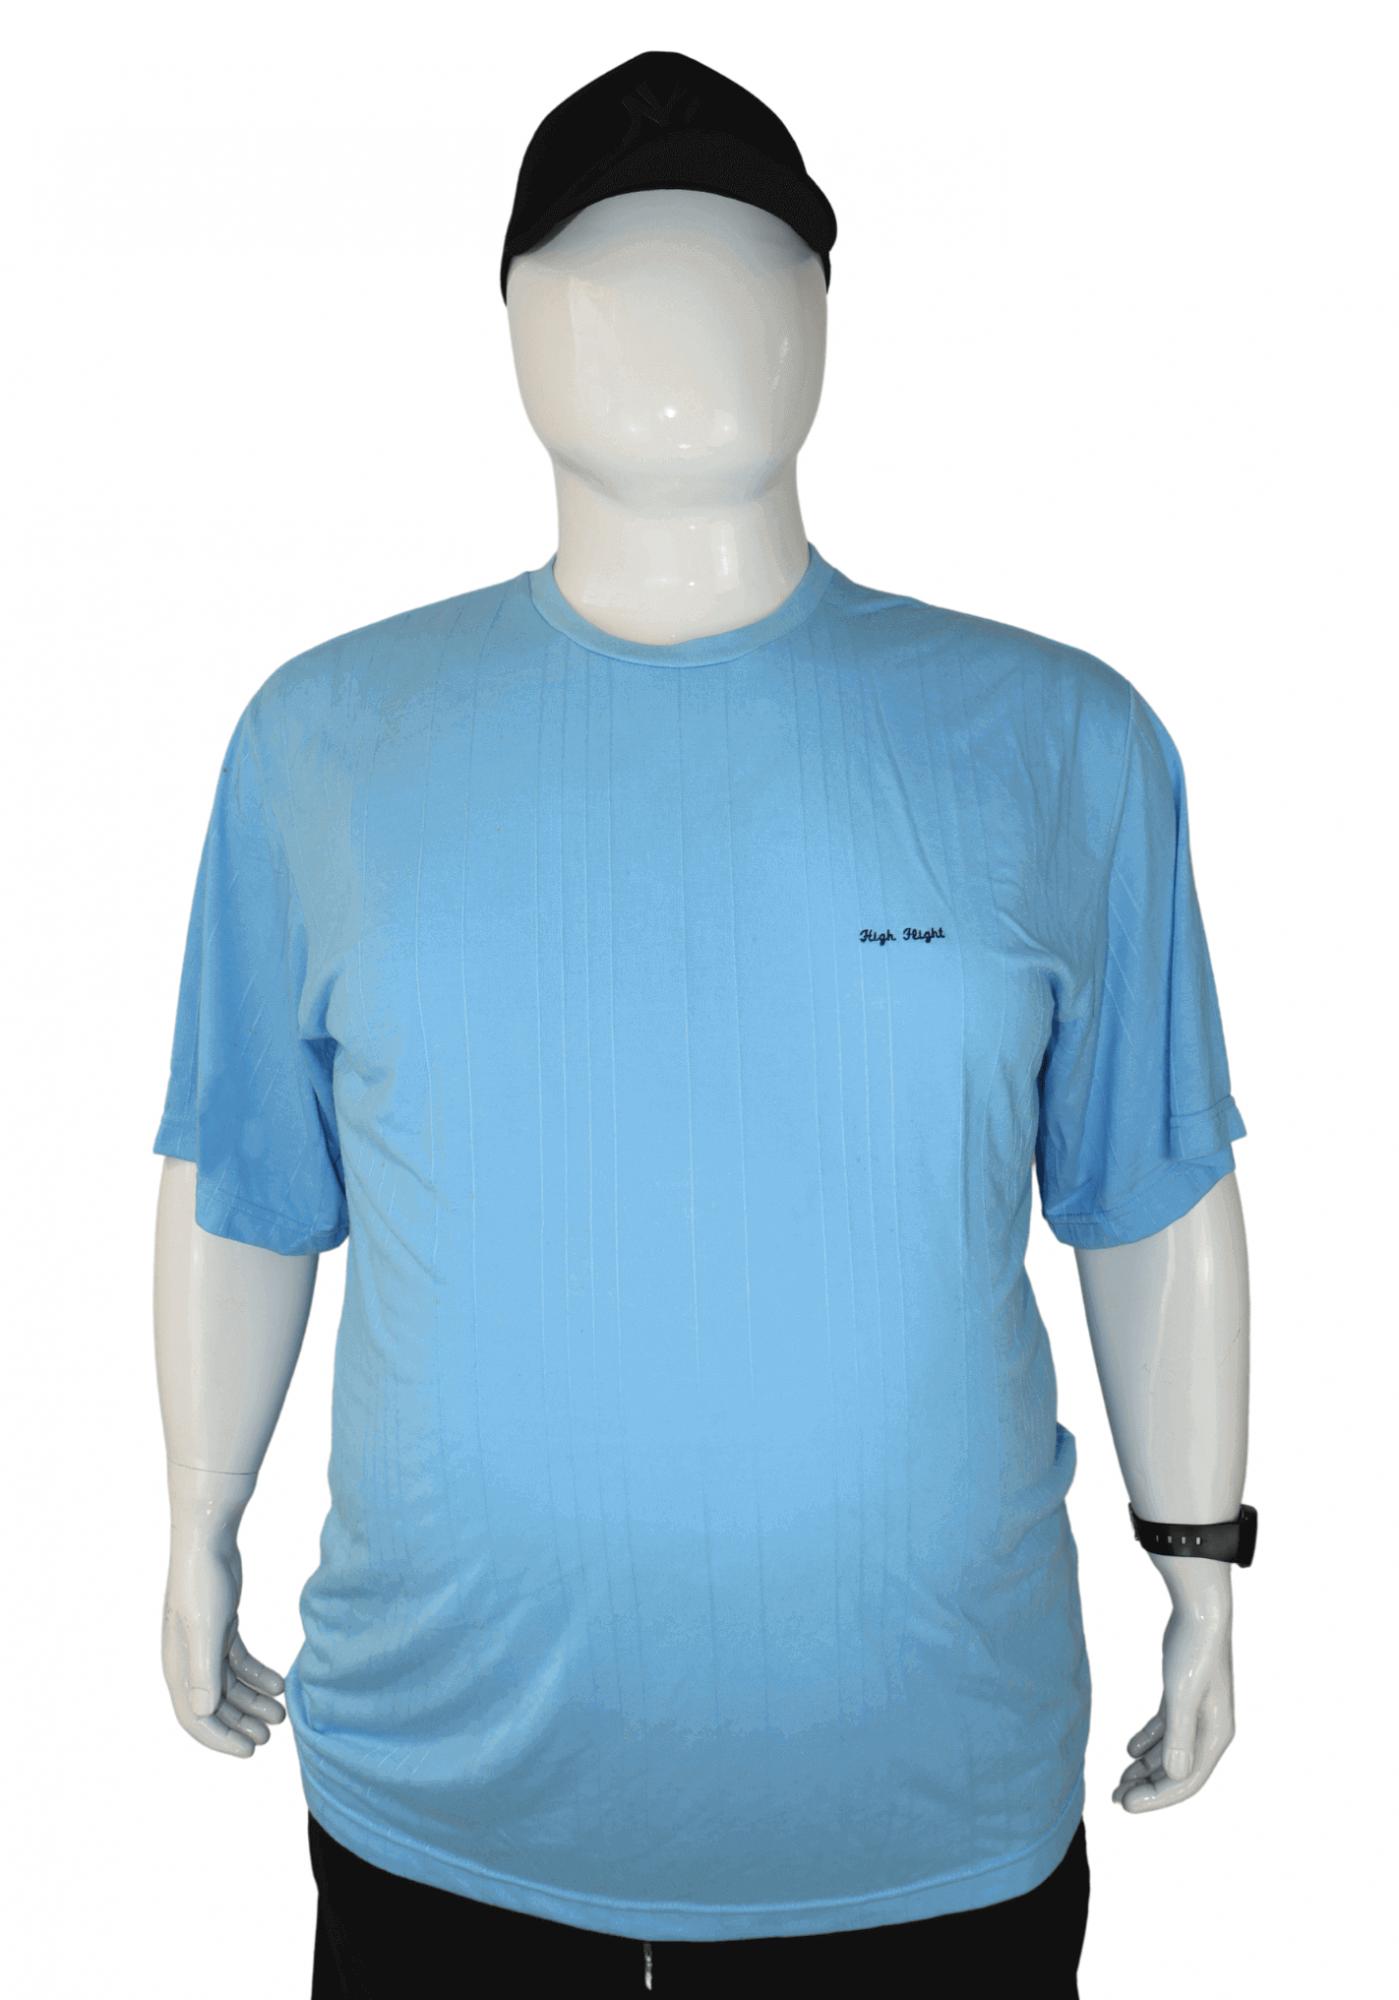 Camiseta Masculina Bordada Plus Size - Promoção